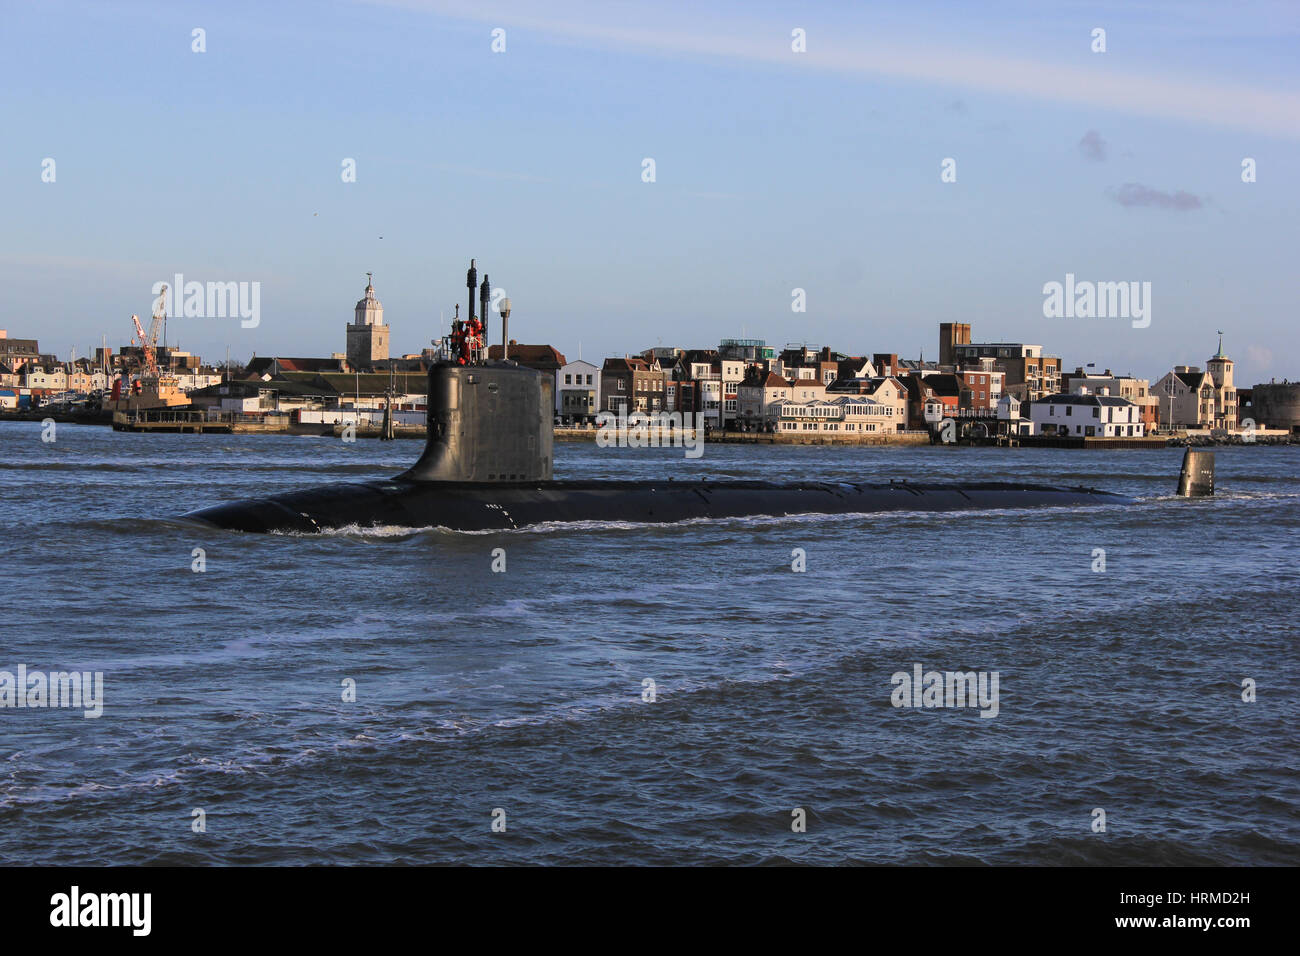 The Virginia Class Submarine Stock Photos & The Virginia